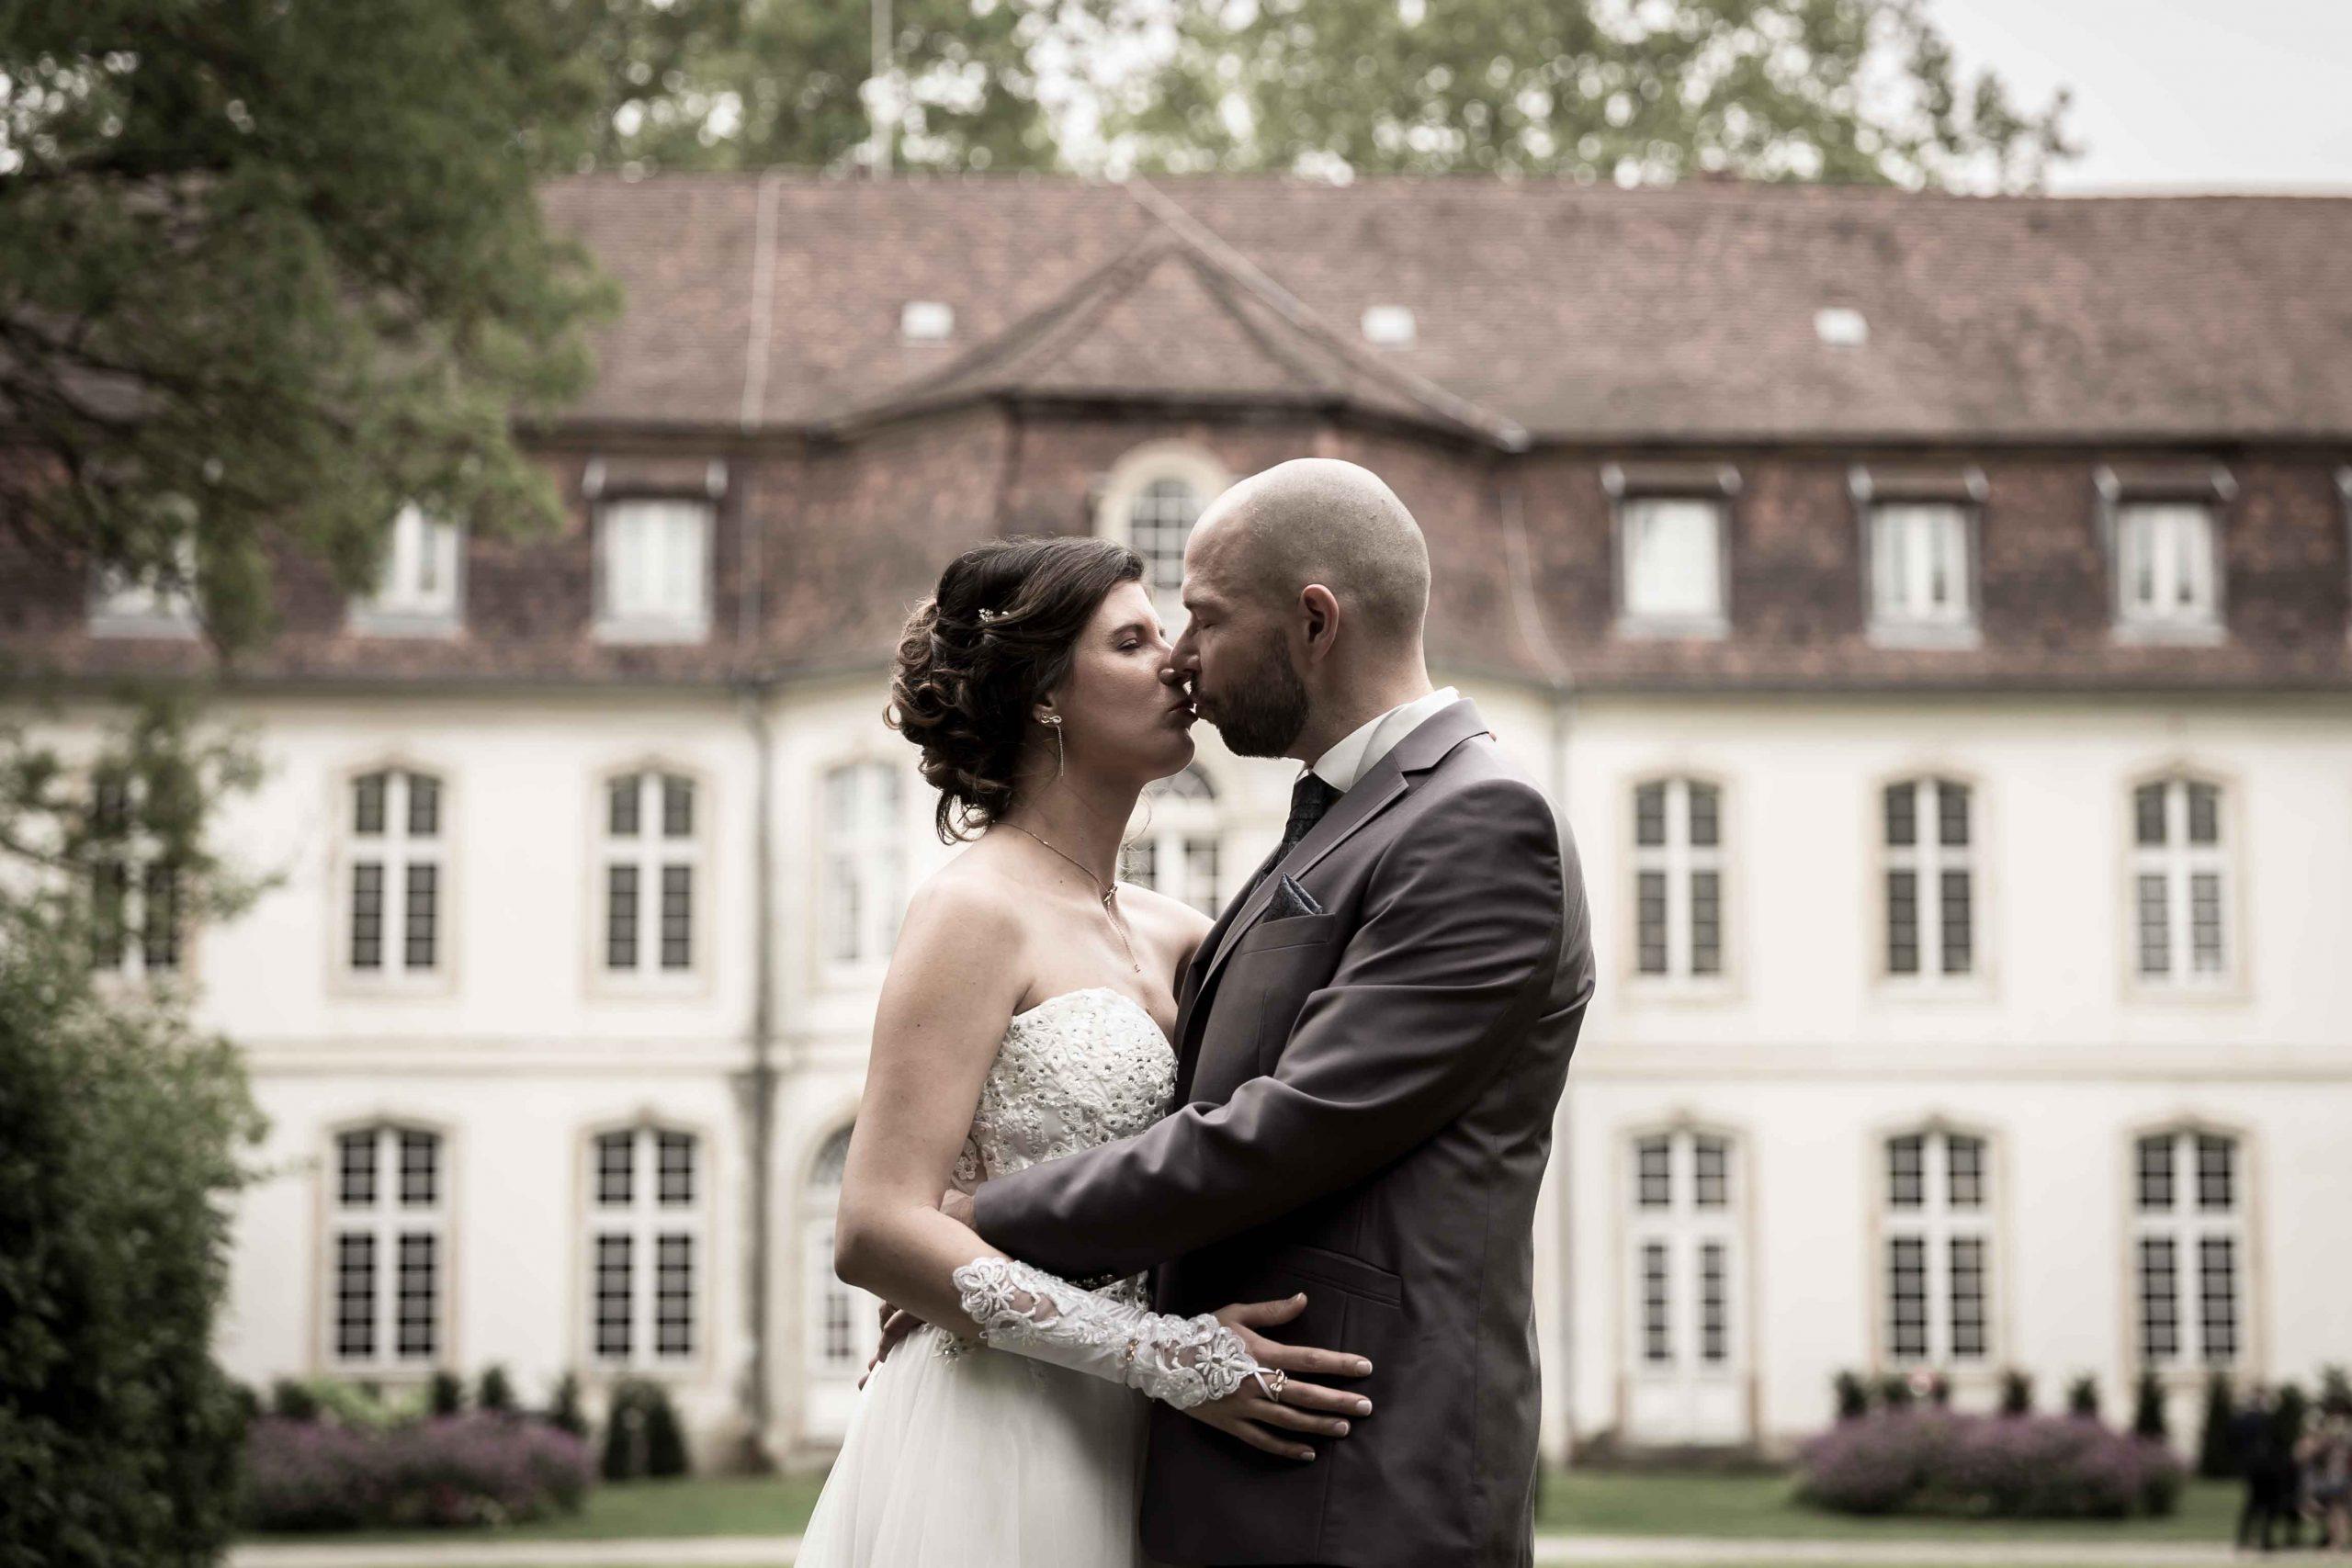 Mariage à la mairie de Rixheim dan sle Haut-Rhin